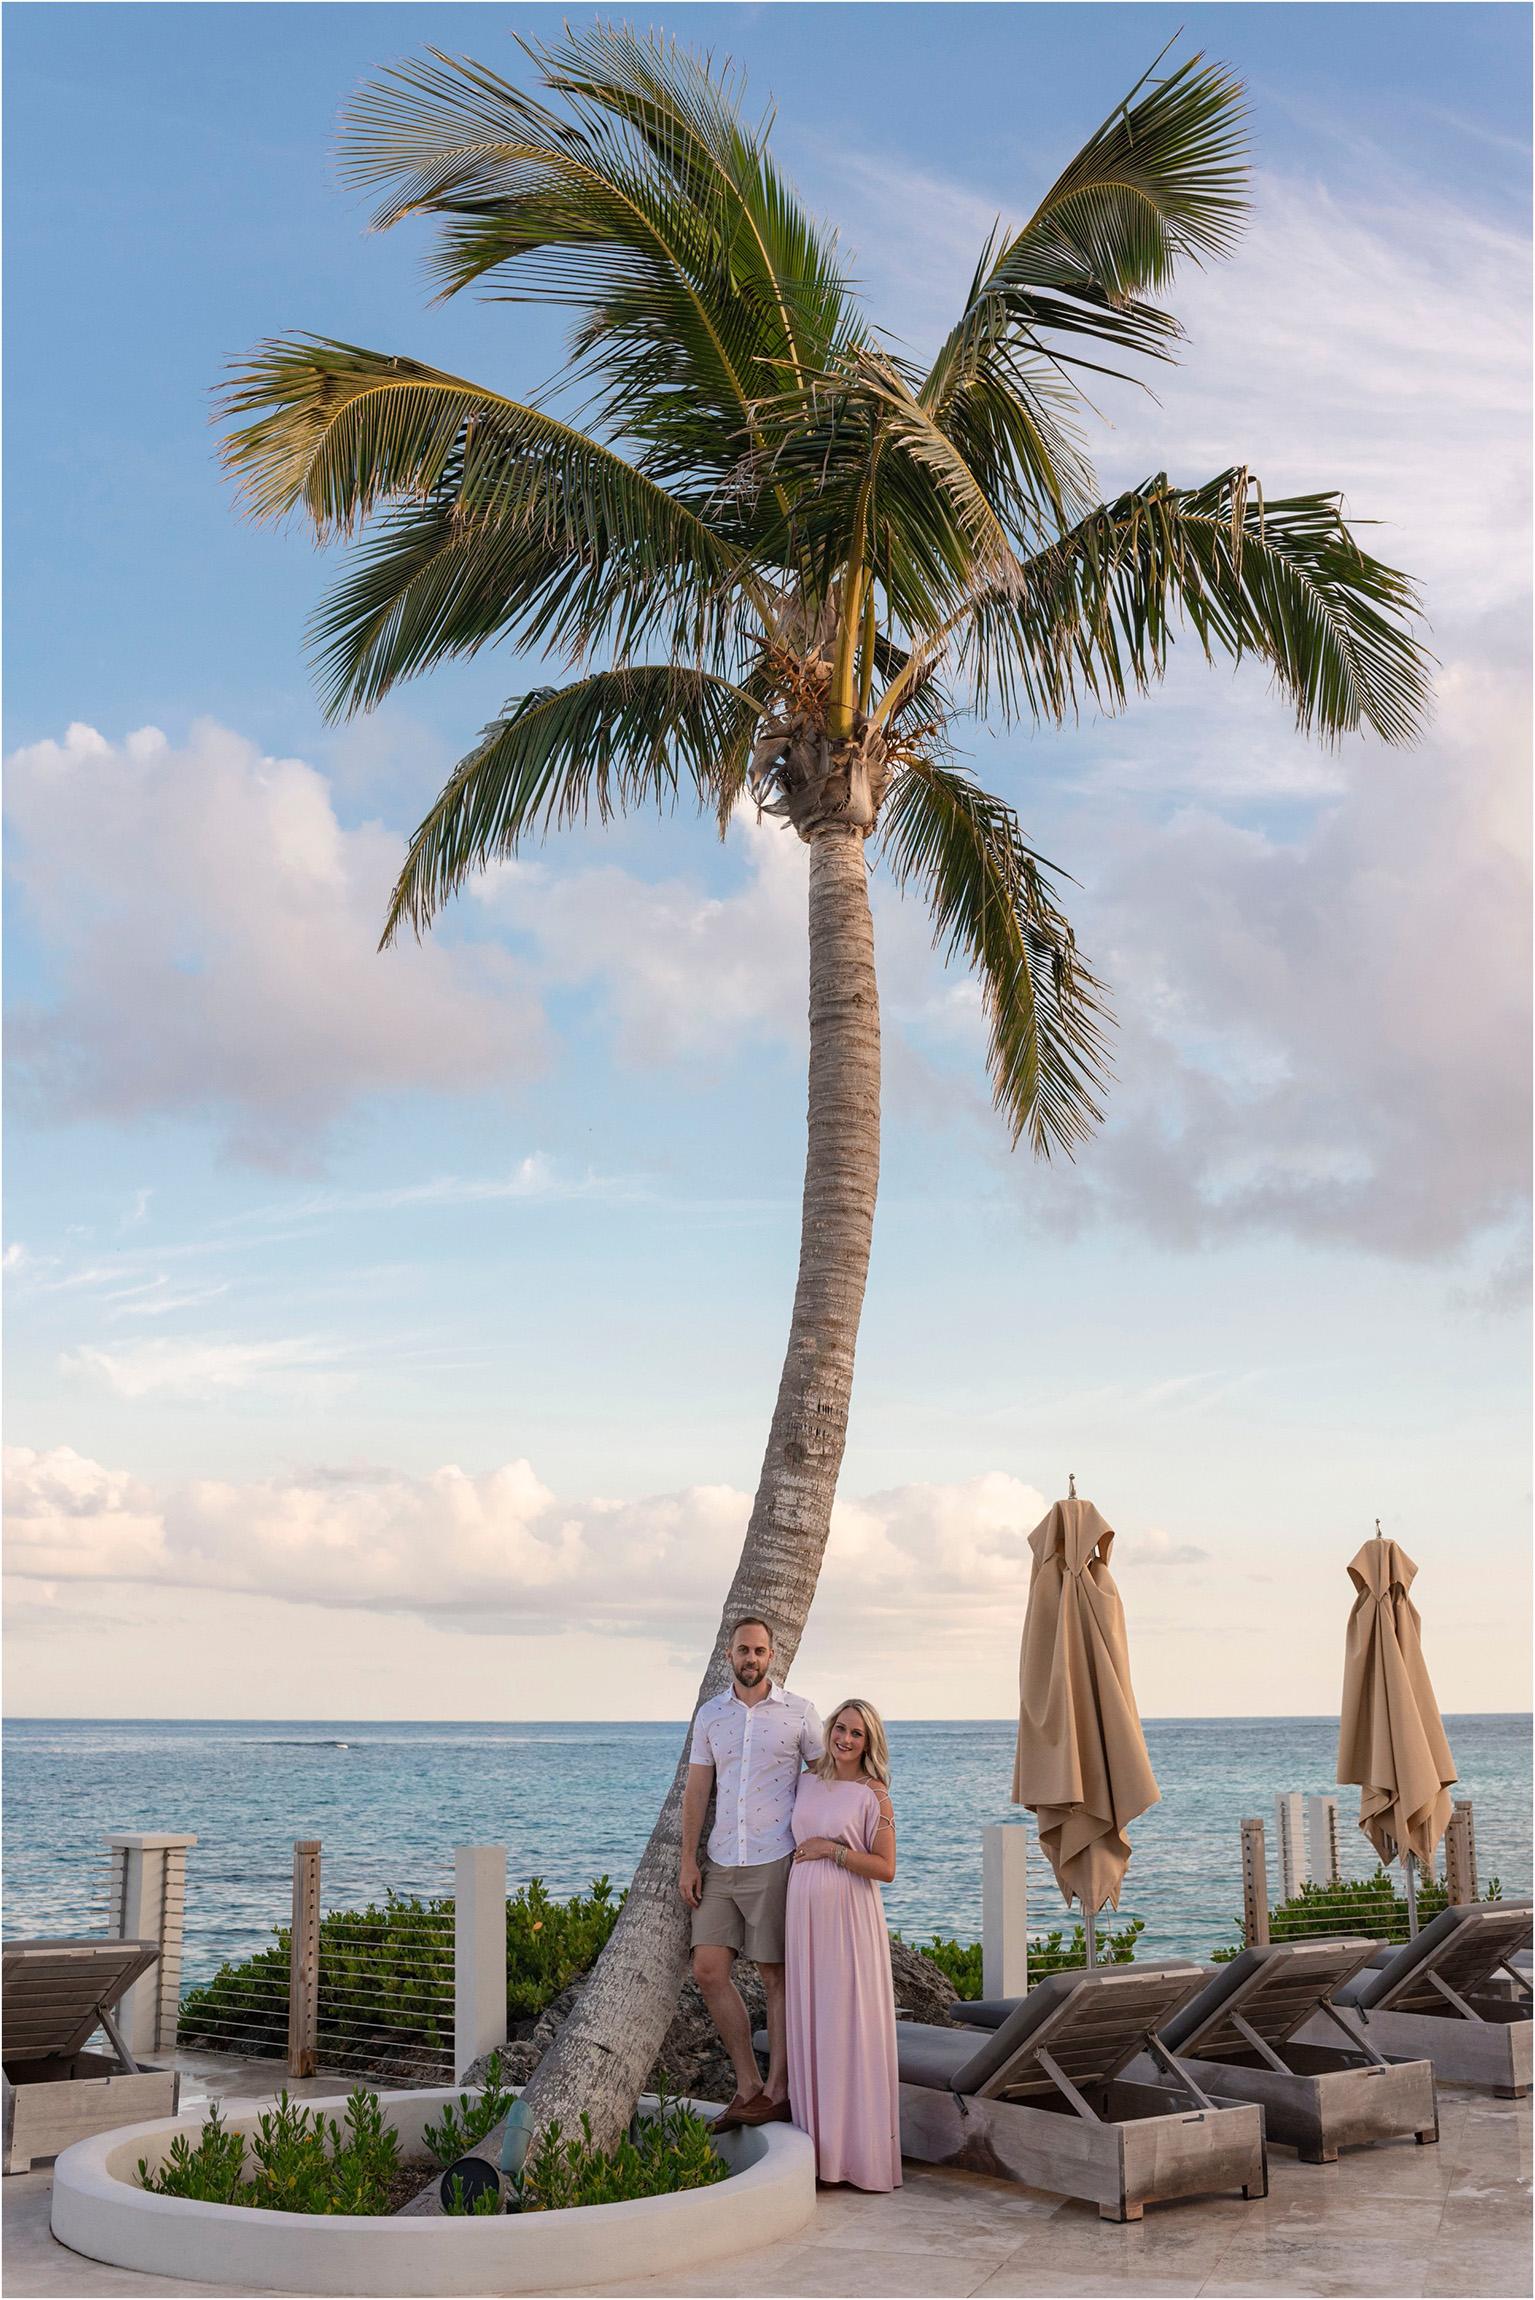 ©FianderFoto_Bermuda_Tom Moore's Jungle_Proposal Maternity Photographer_Erika_Andy_020.jpg